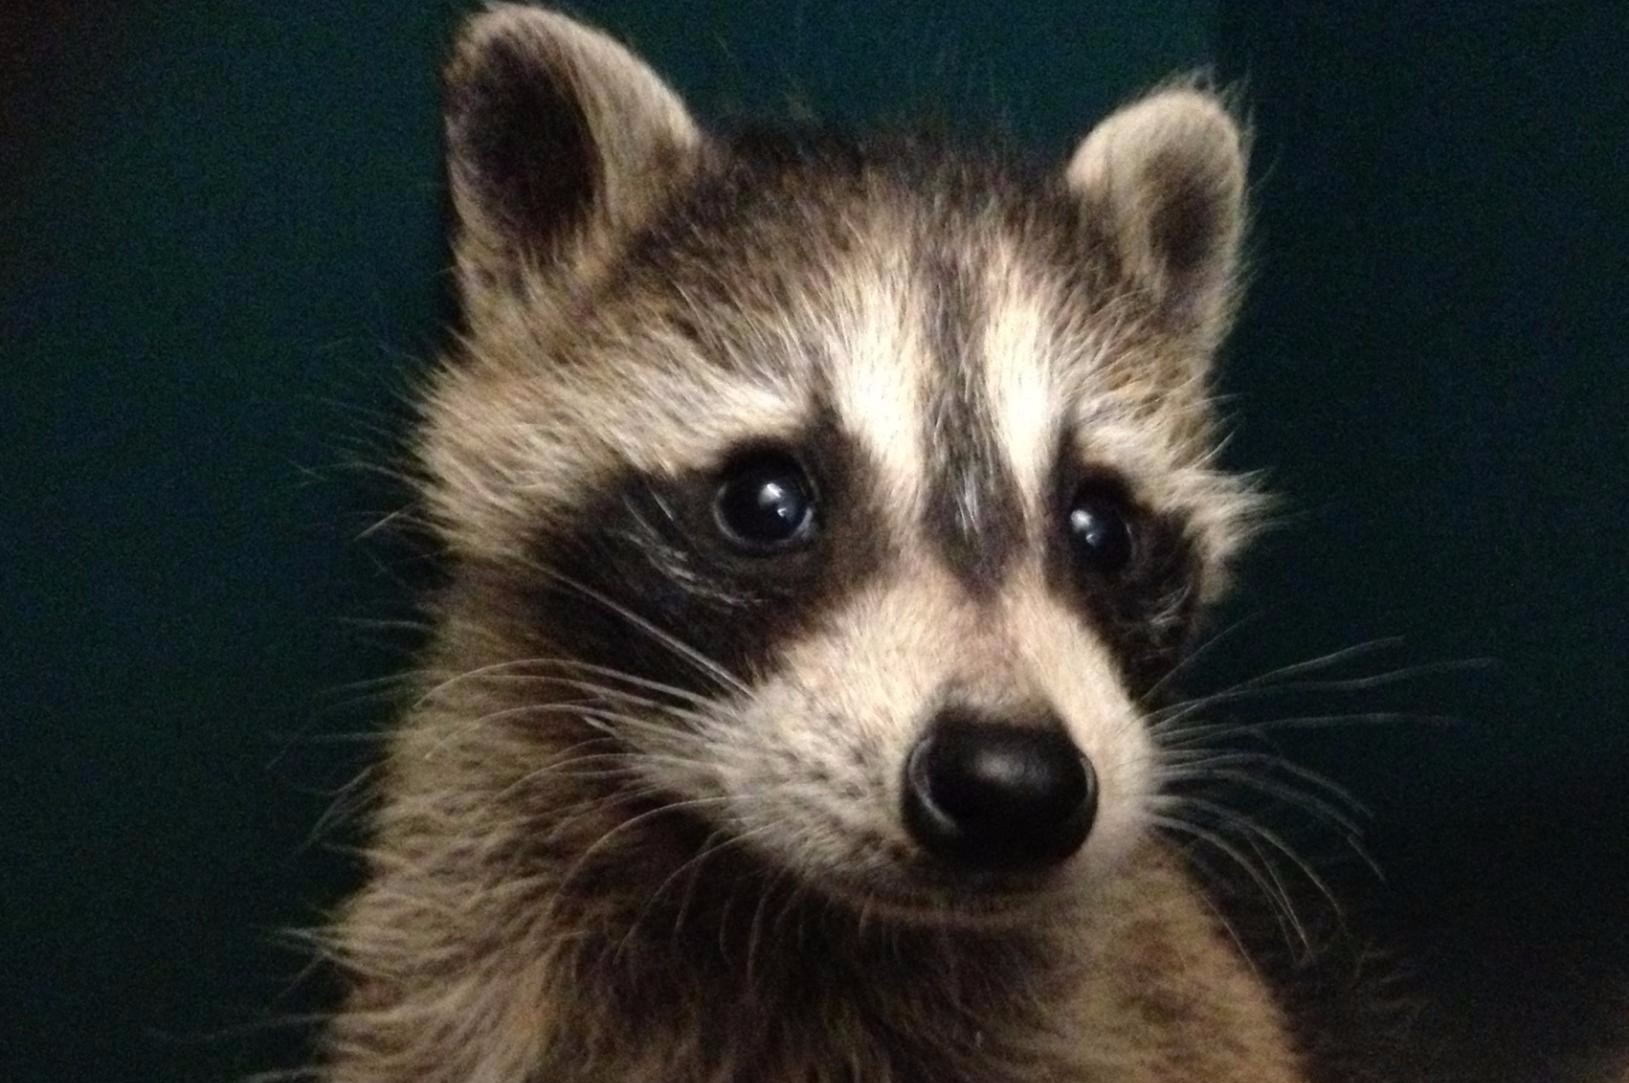 nebraska wildlife rehab inc wildlife help nuisance wildlife